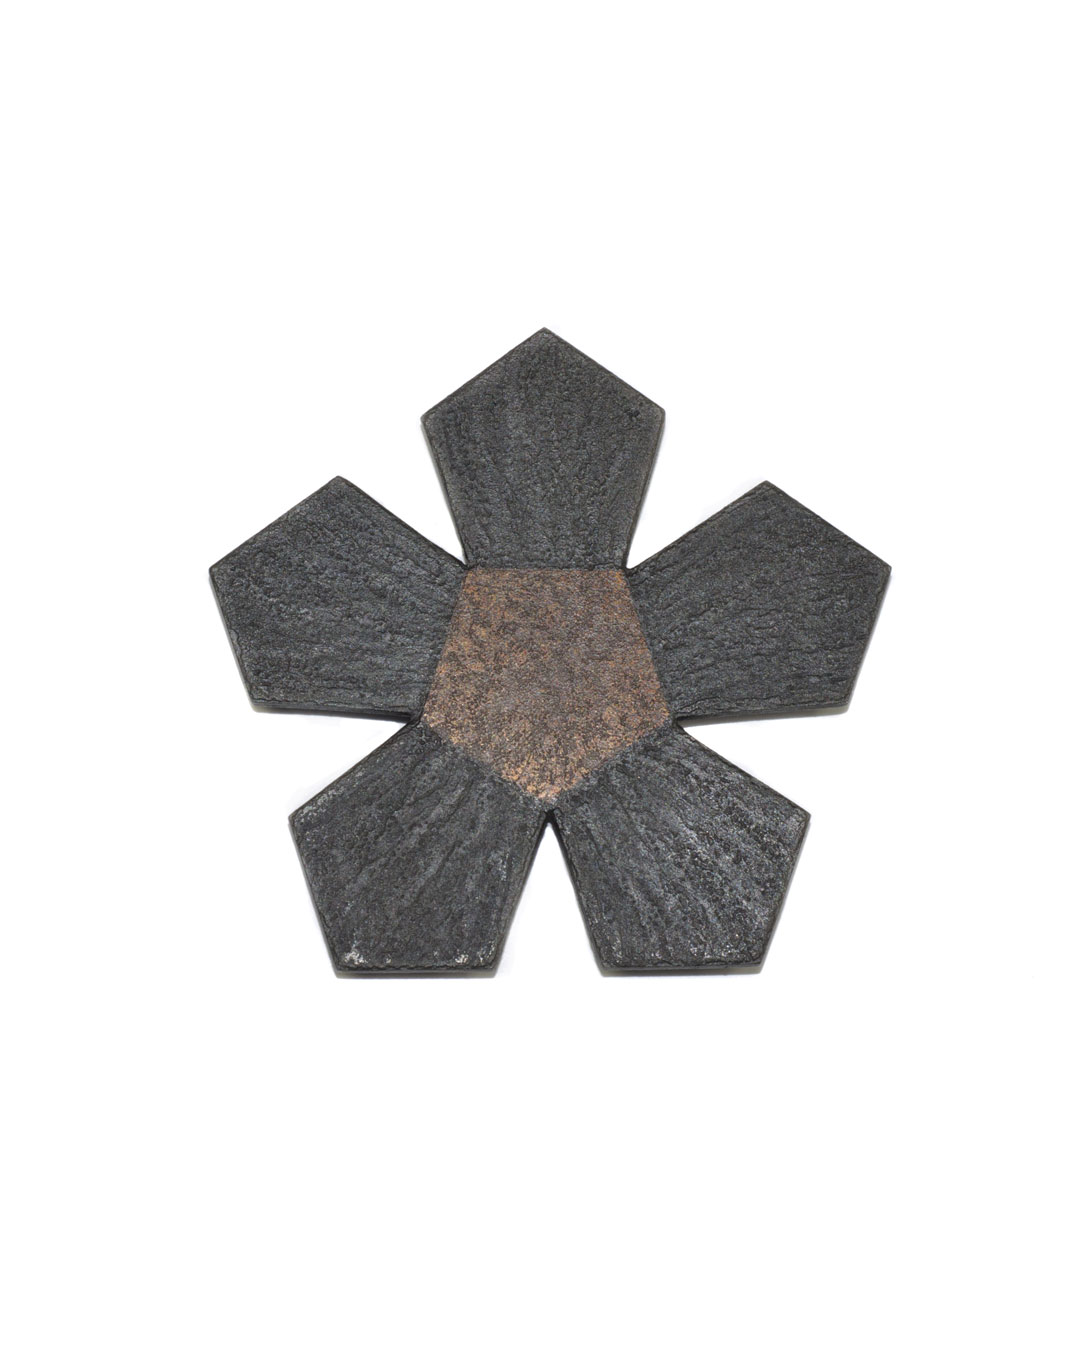 Tore Svensson, Pentagon, 2008, brooch; etched steel, partly gilt, 64 x 64 x 1.5 mm, €425